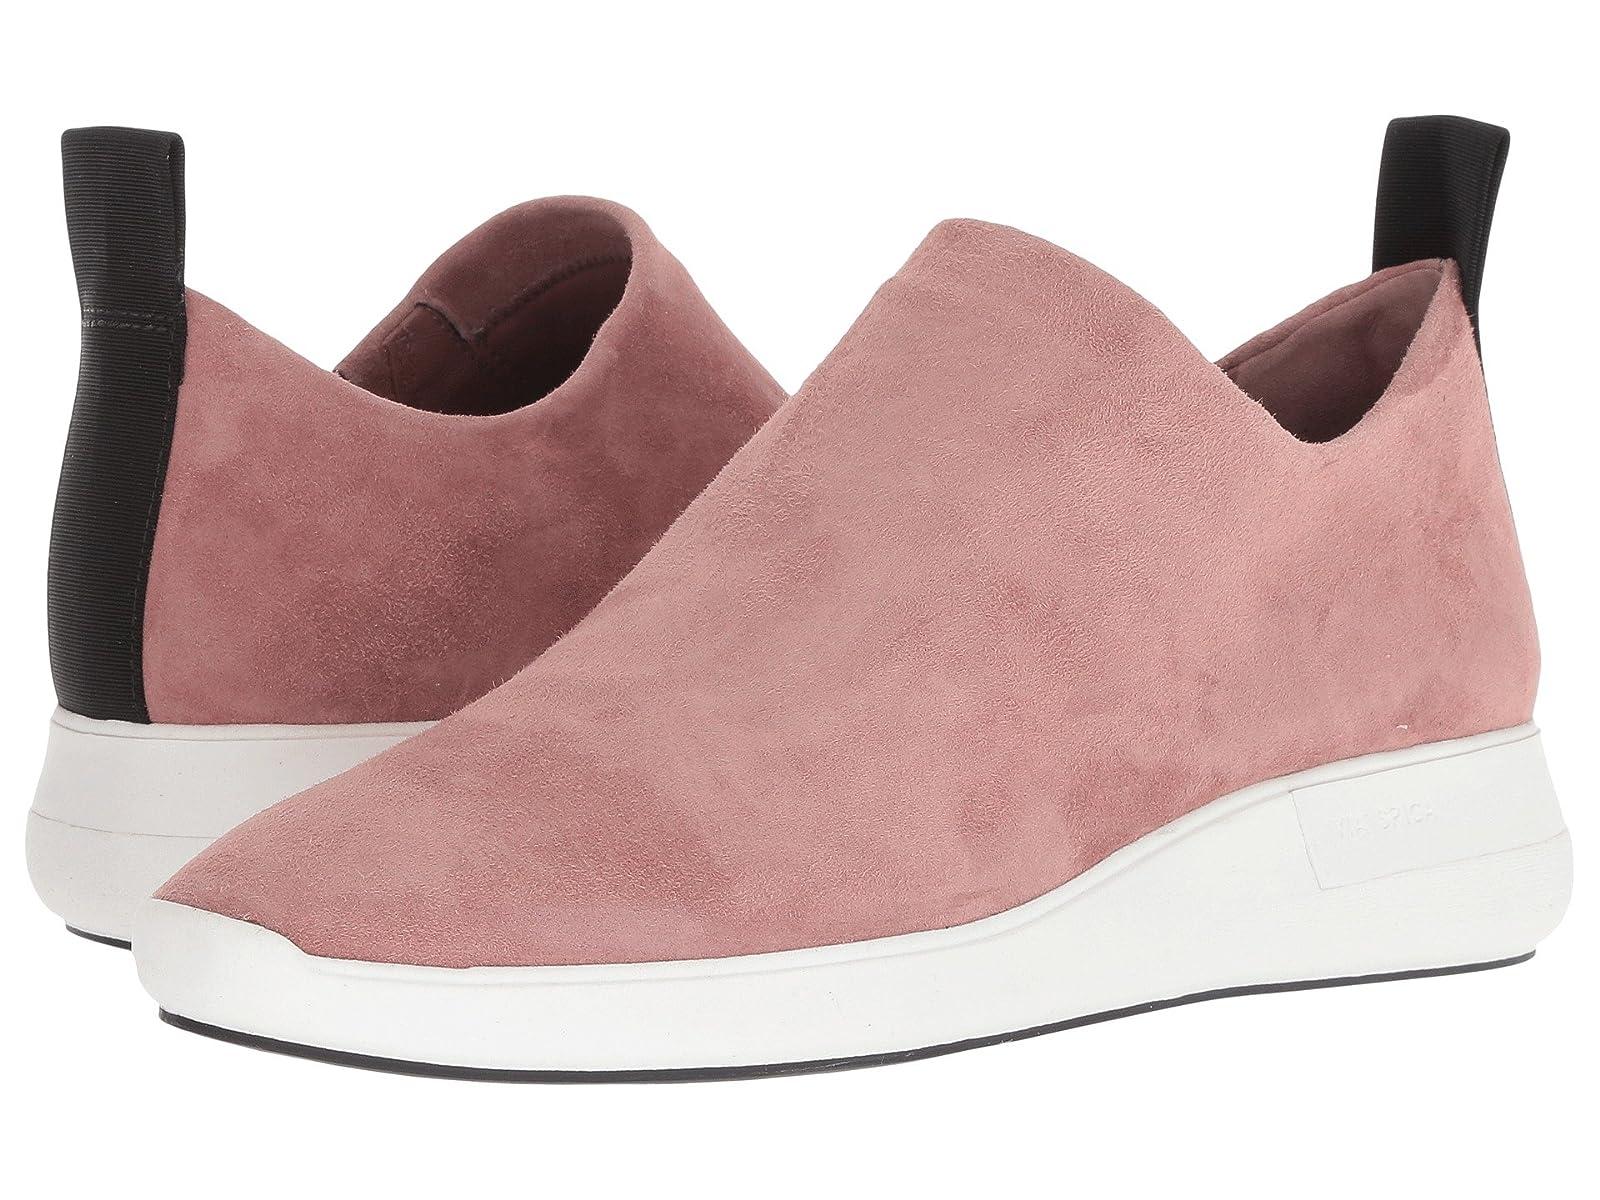 Via Spiga MarlowAtmospheric grades have affordable shoes